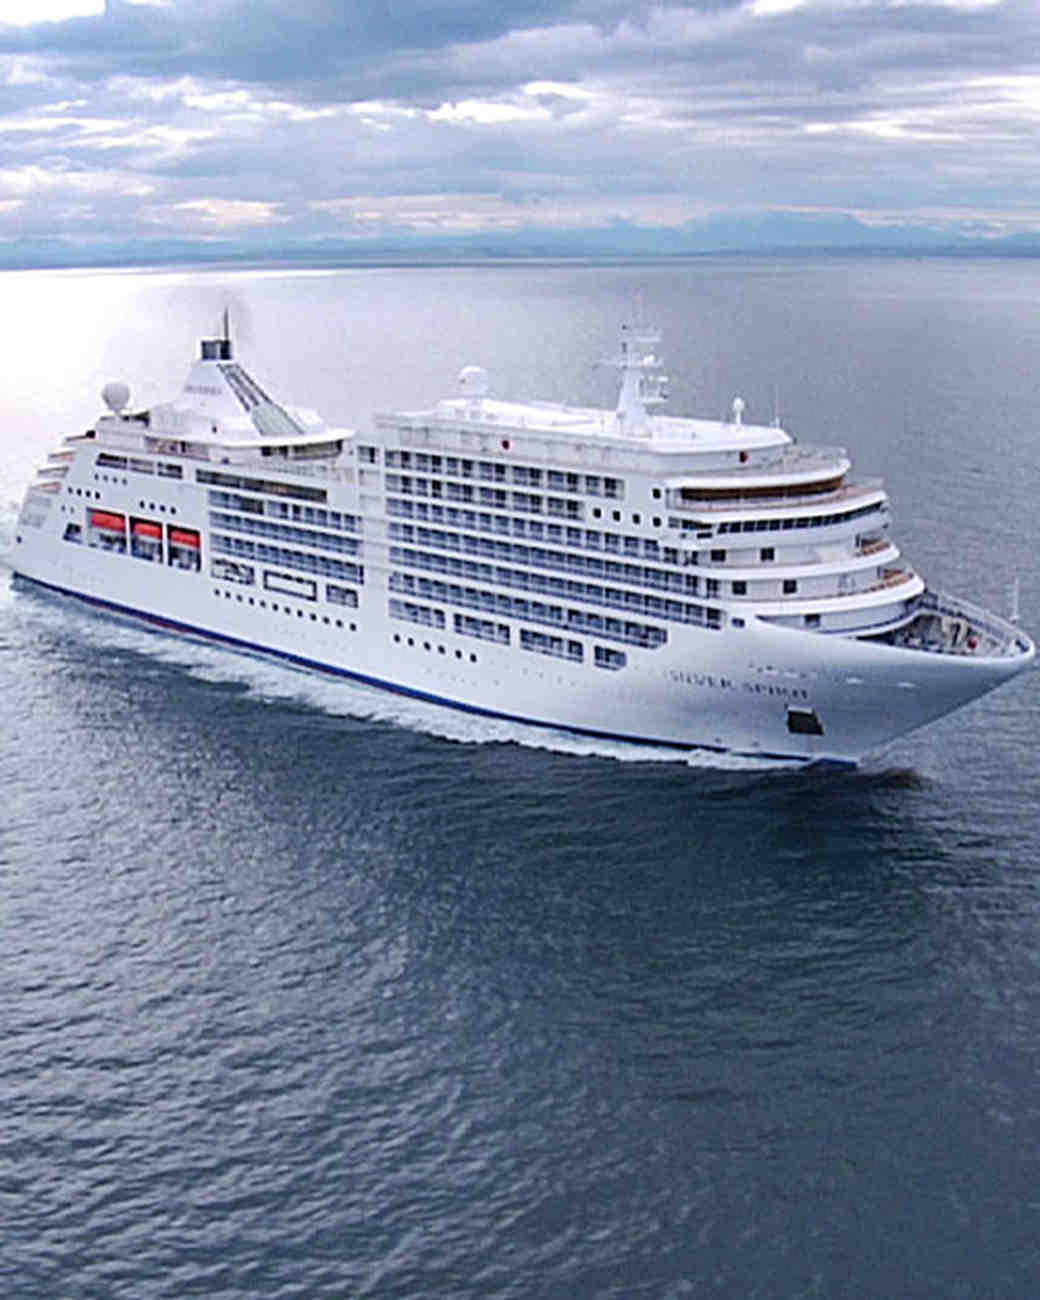 mwd_0111_cruise_silver-spirit.jpg